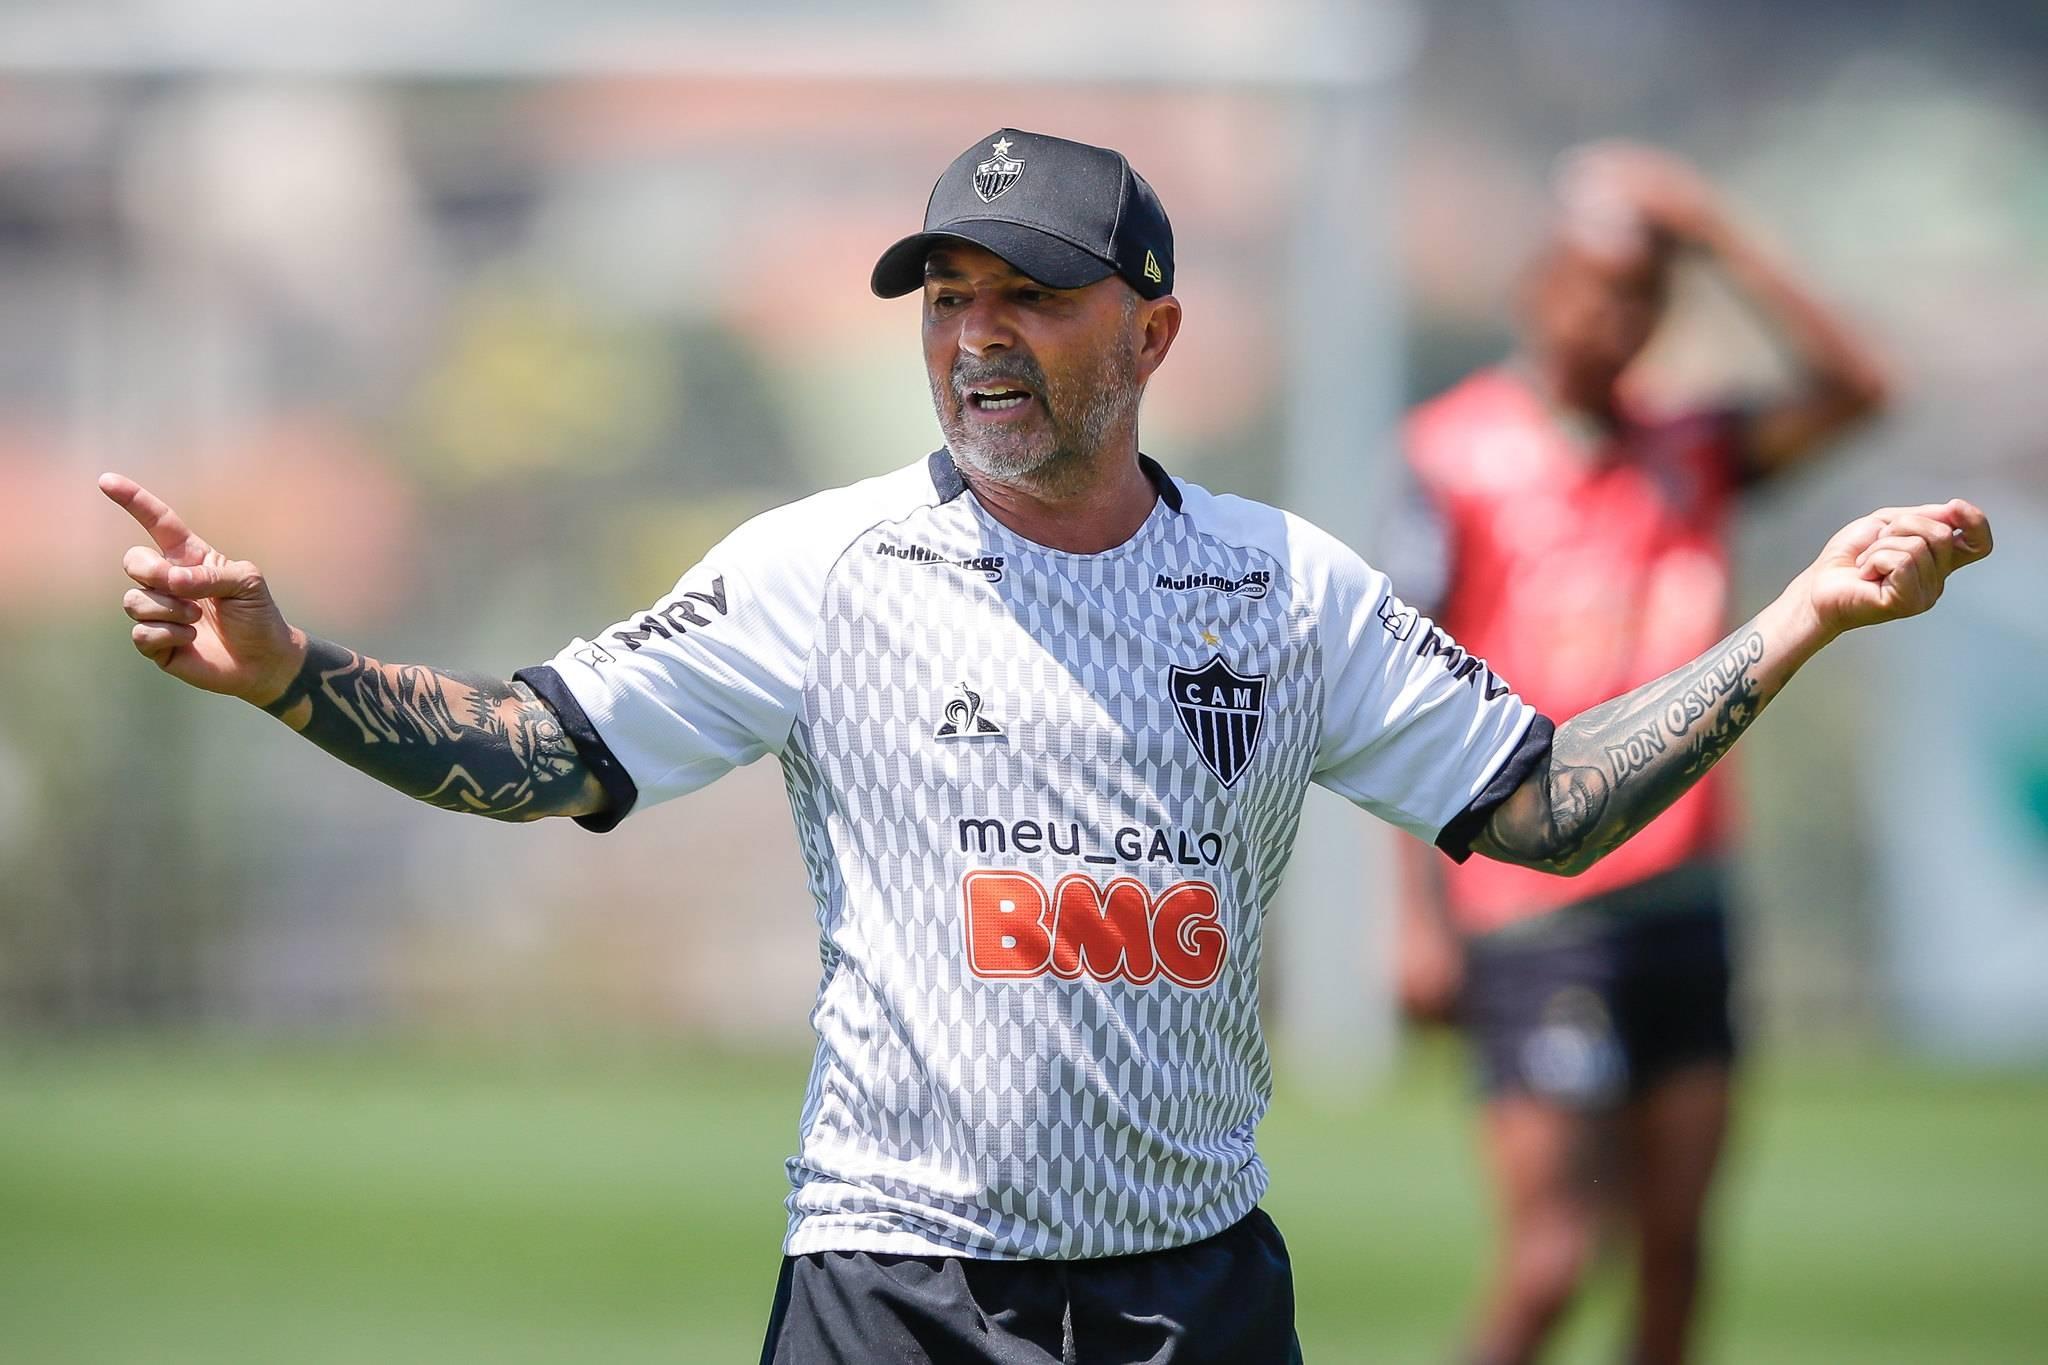 Técnico Jorge Sampaoli, técnico do Atlético-MG